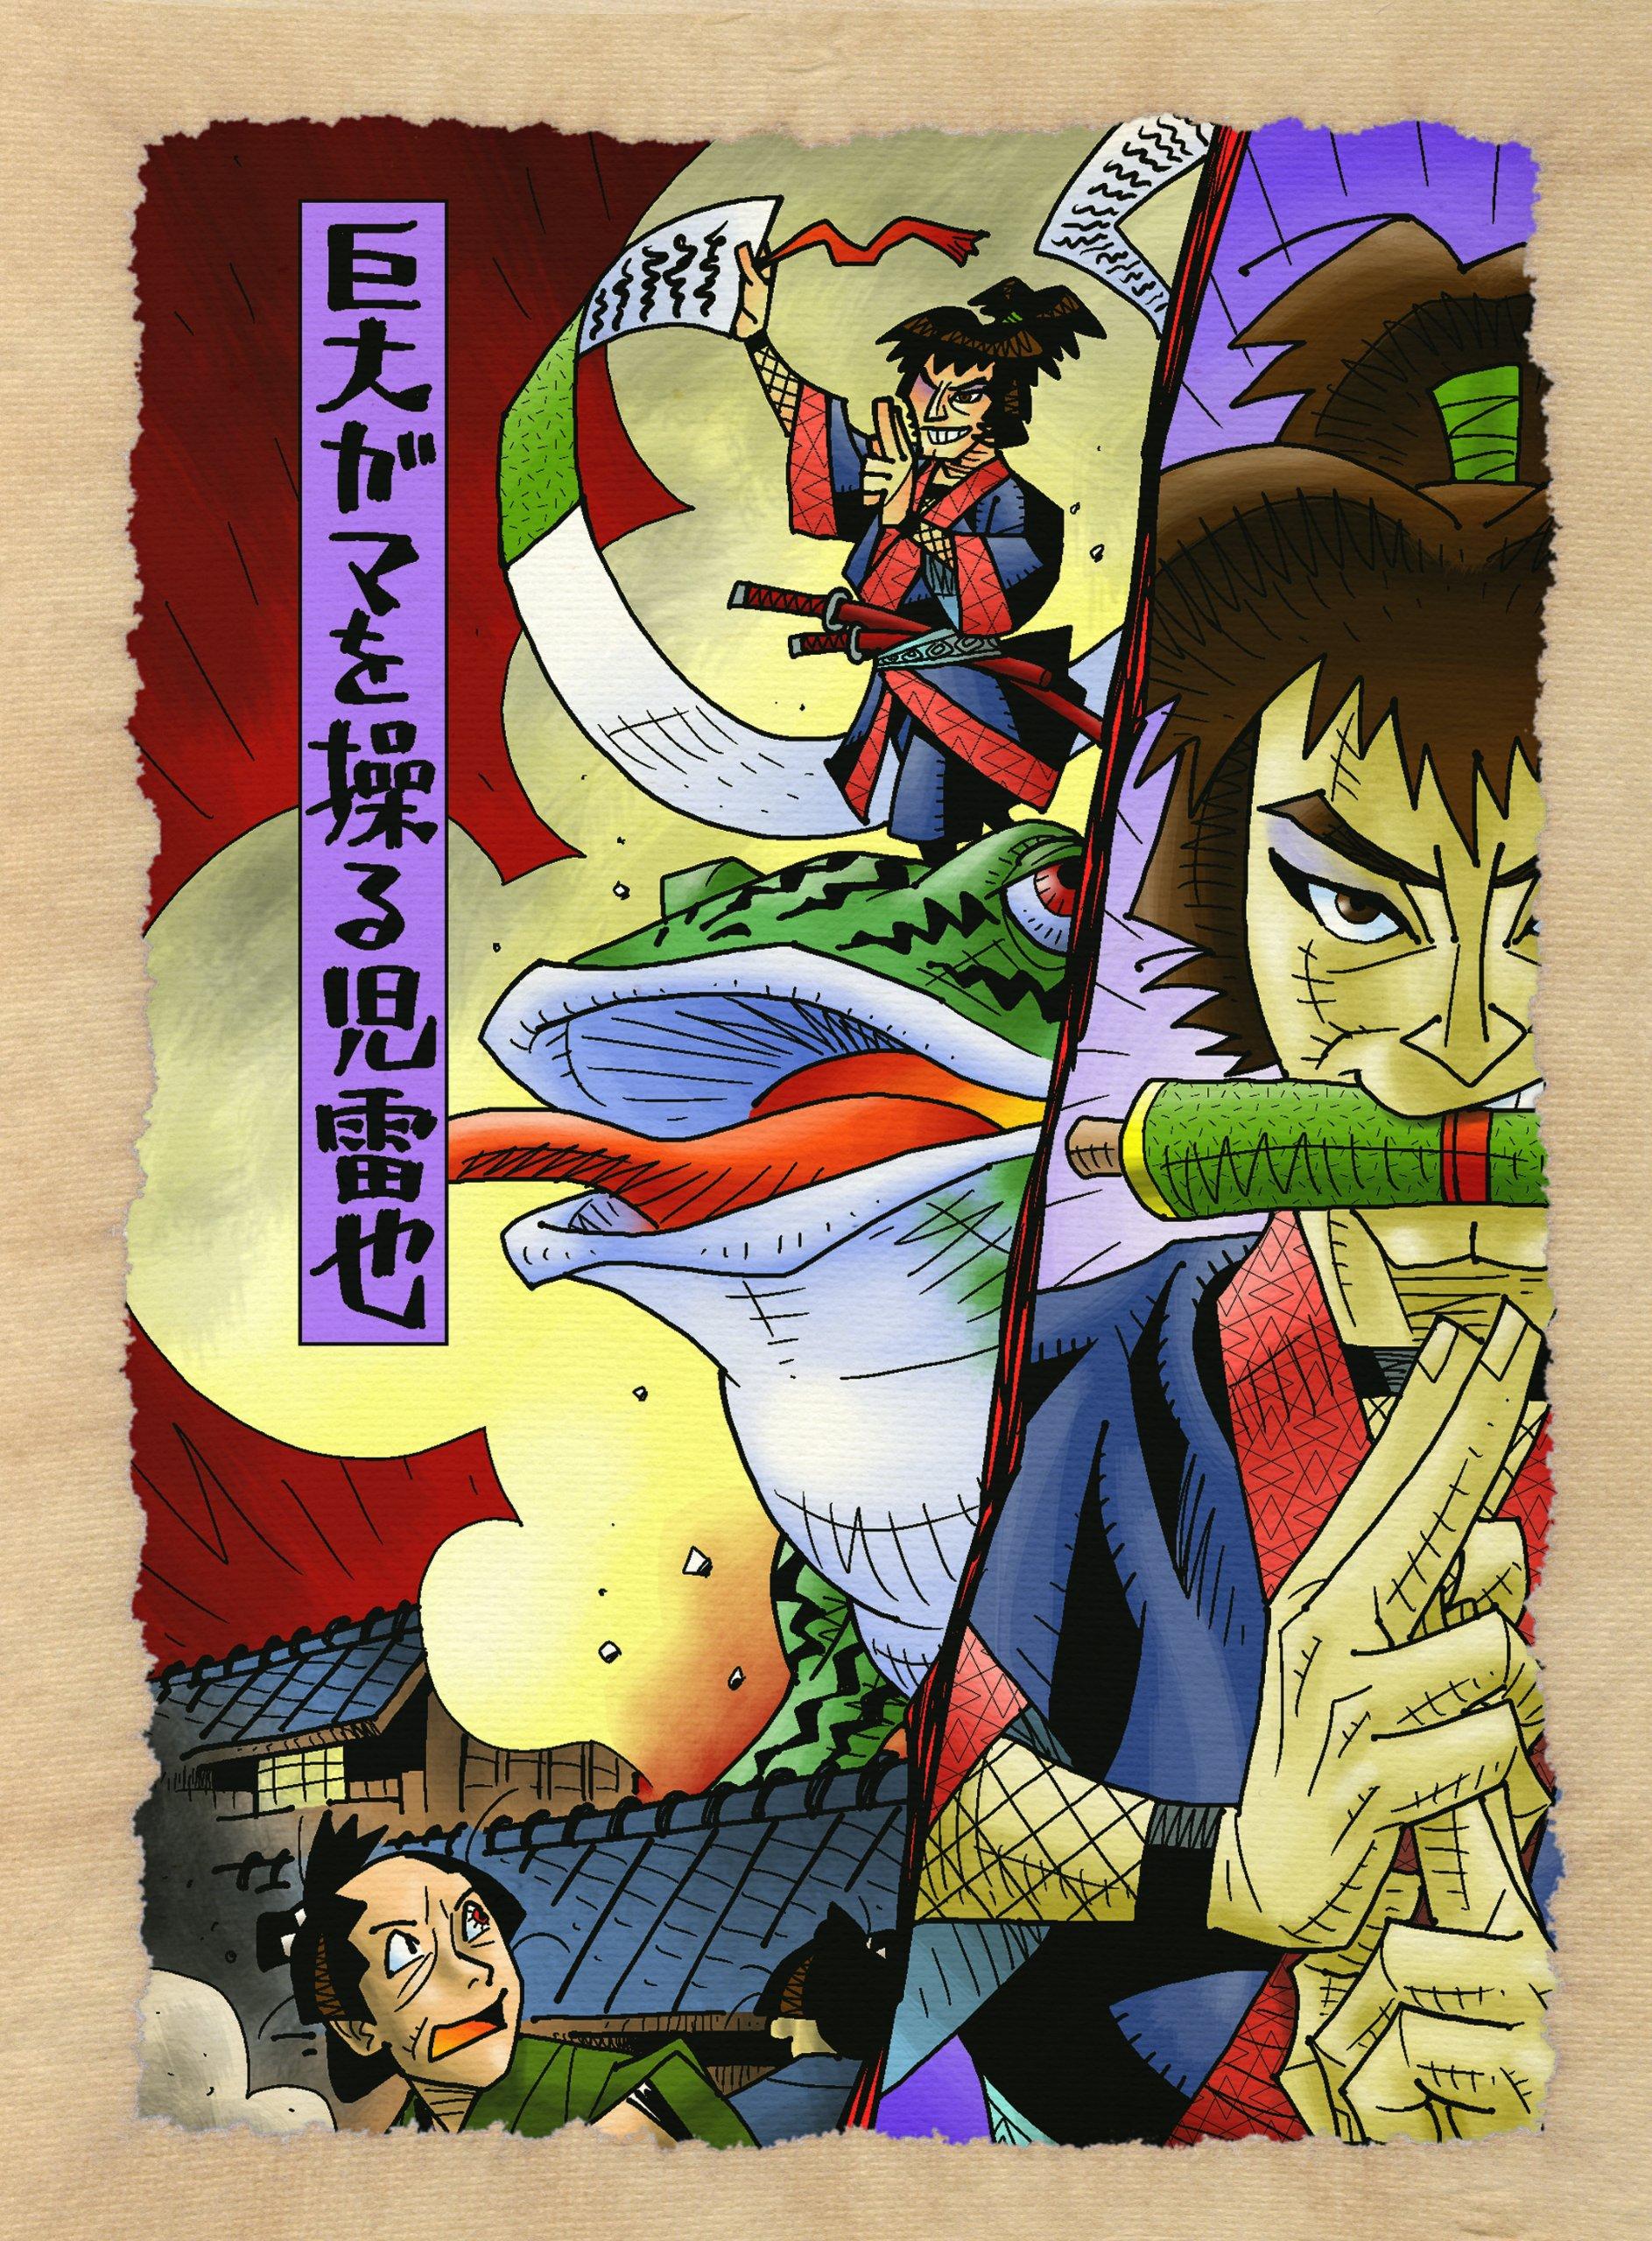 Ninja Attack!: True Tales Of Assassins, Samurai And Outlaws ...